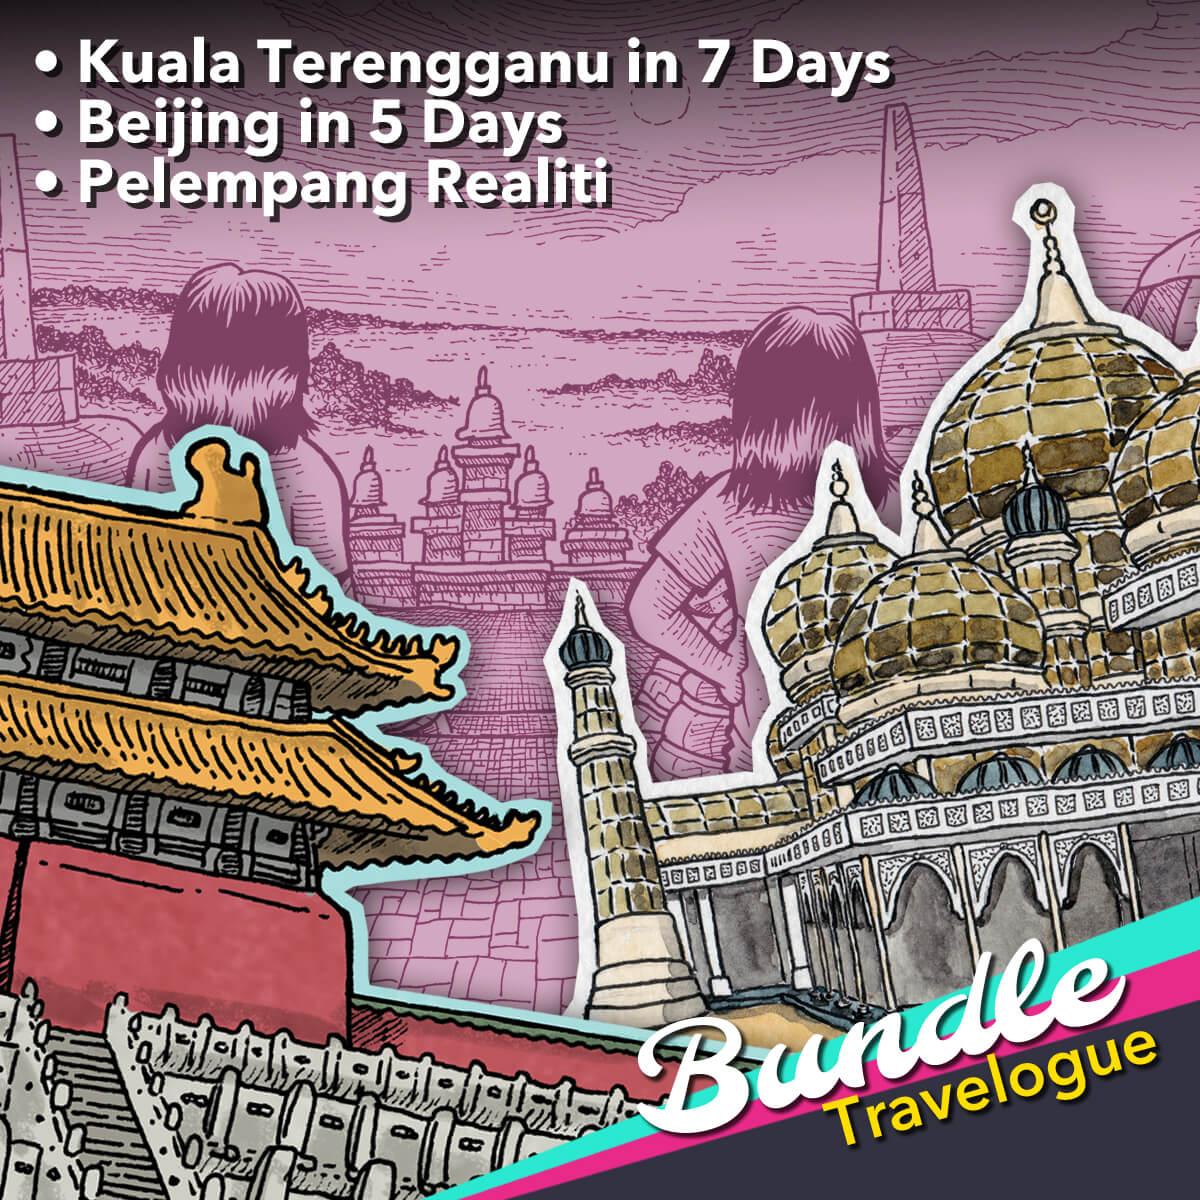 bundle-travelogue-1547996384.jpg